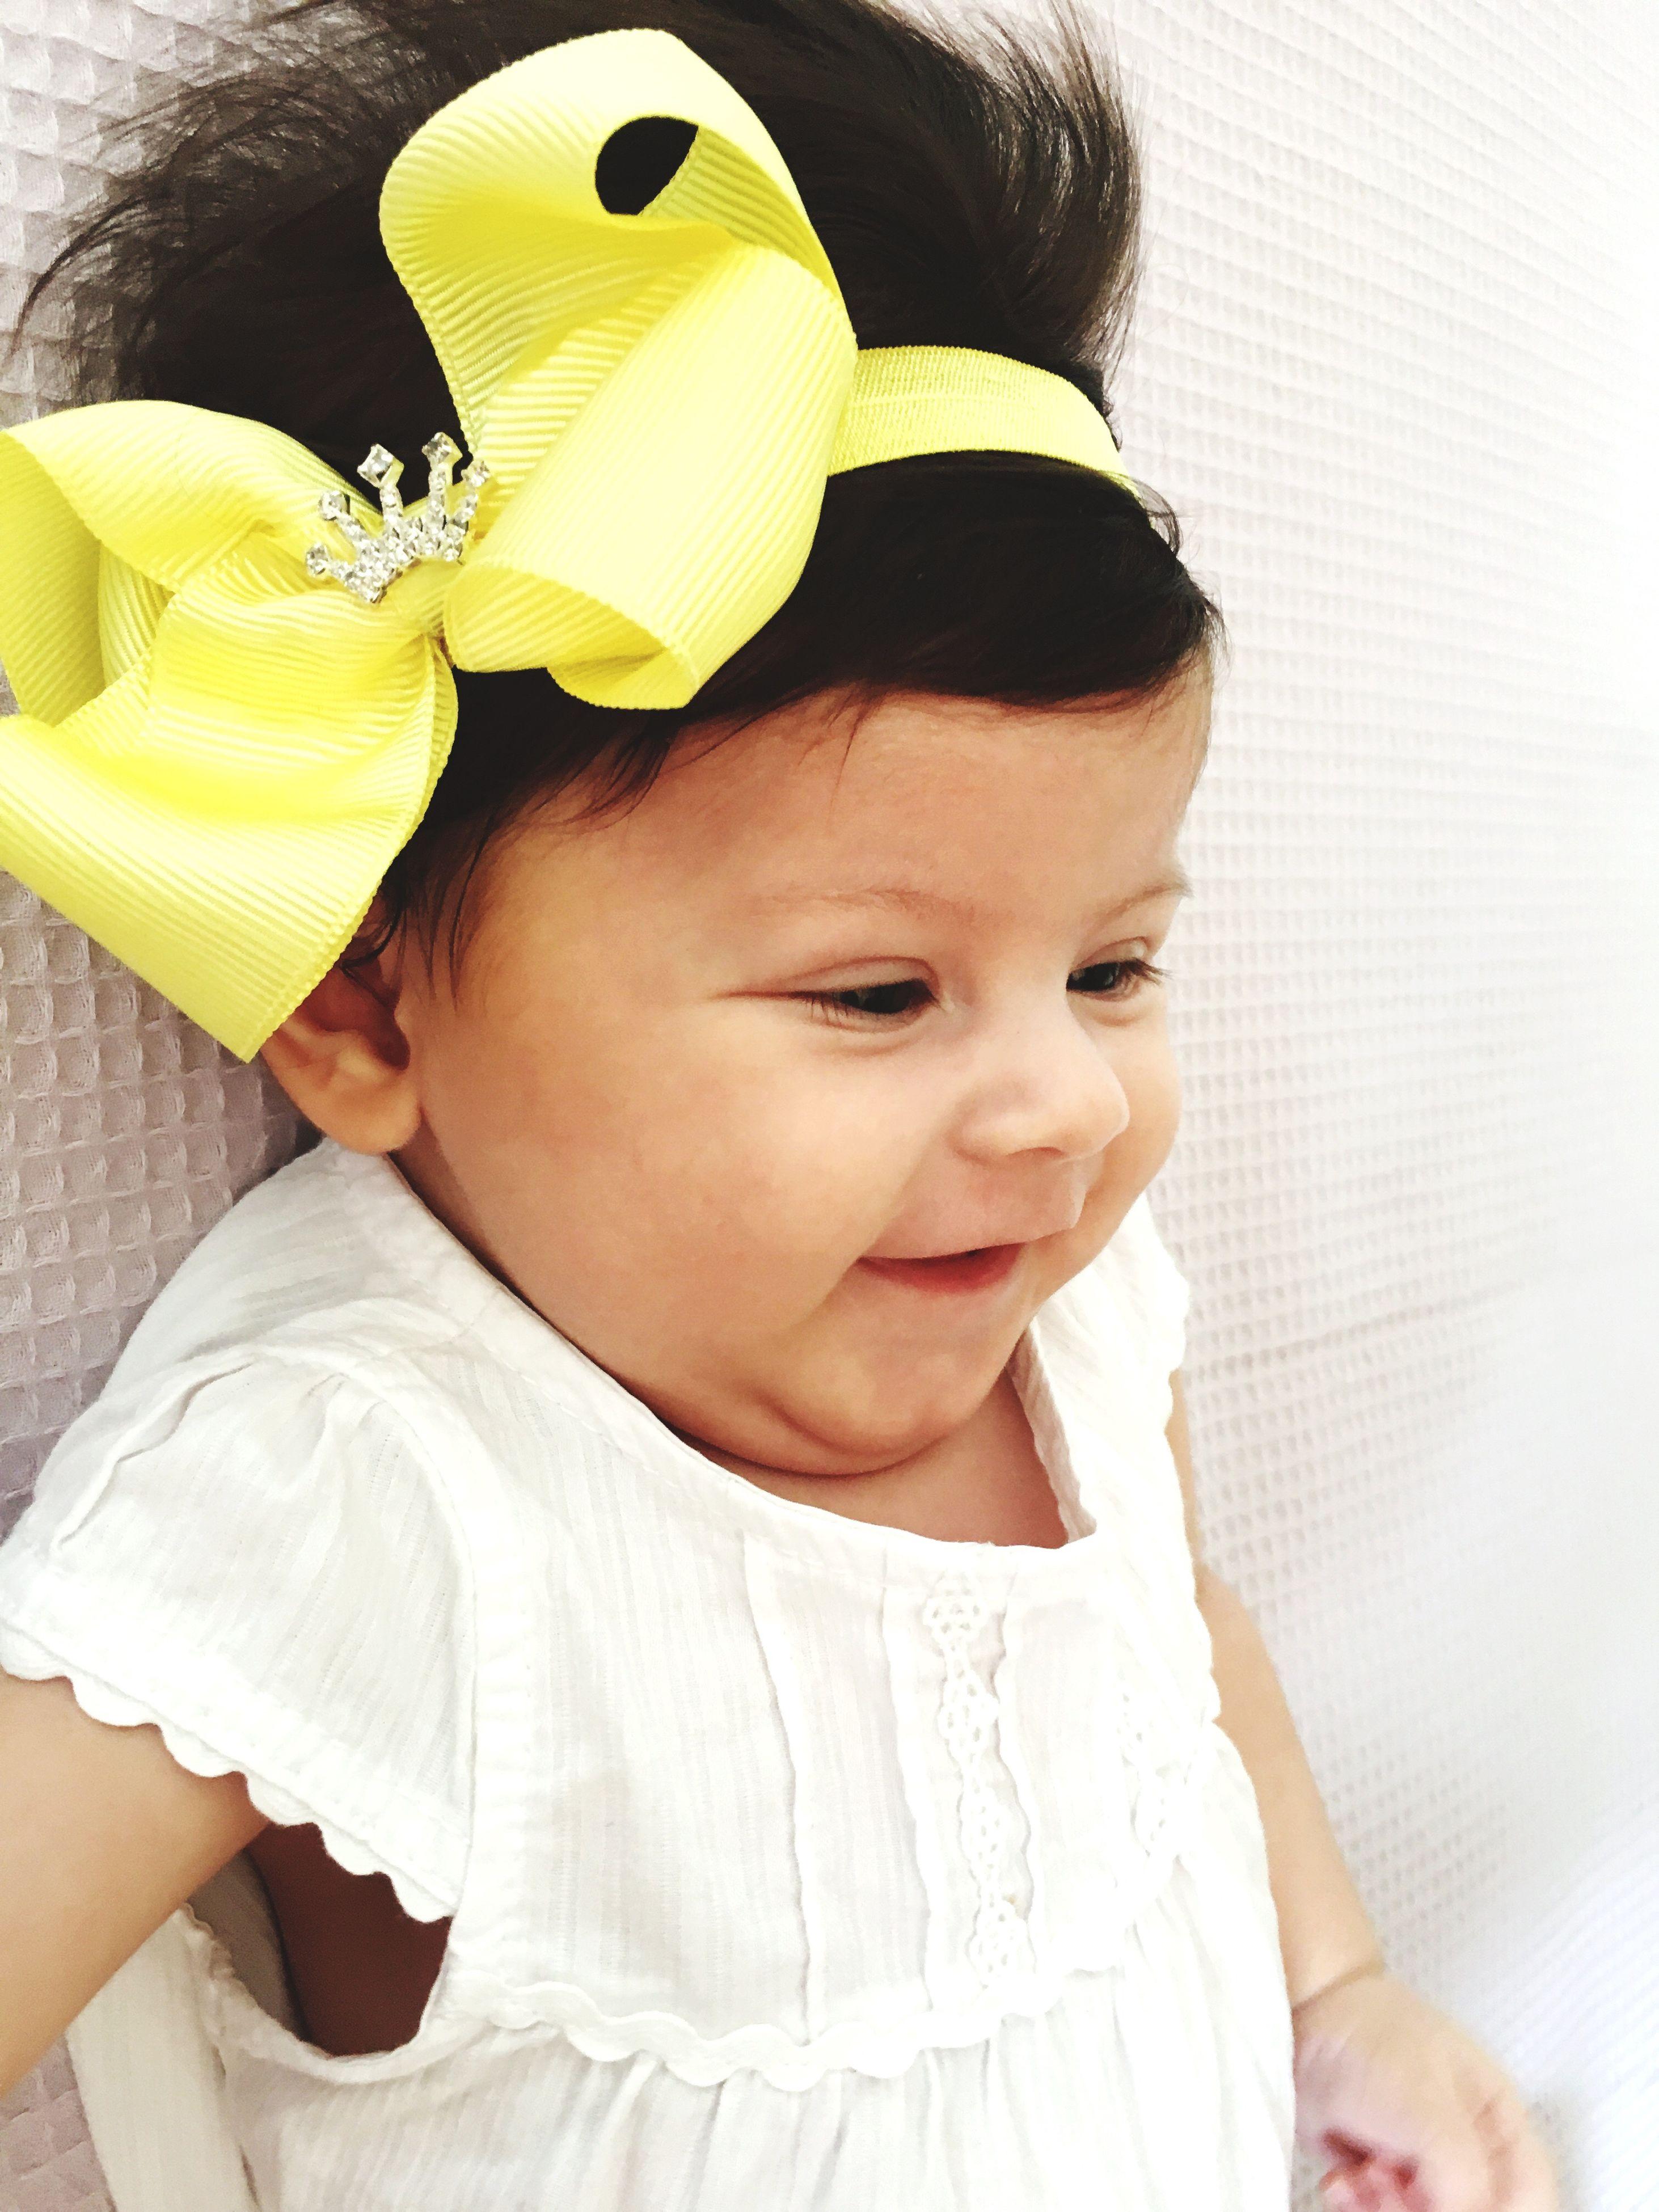 childhood, cute, innocence, lifestyles, leisure activity, headshot, yellow, casual clothing, portrait, close-up